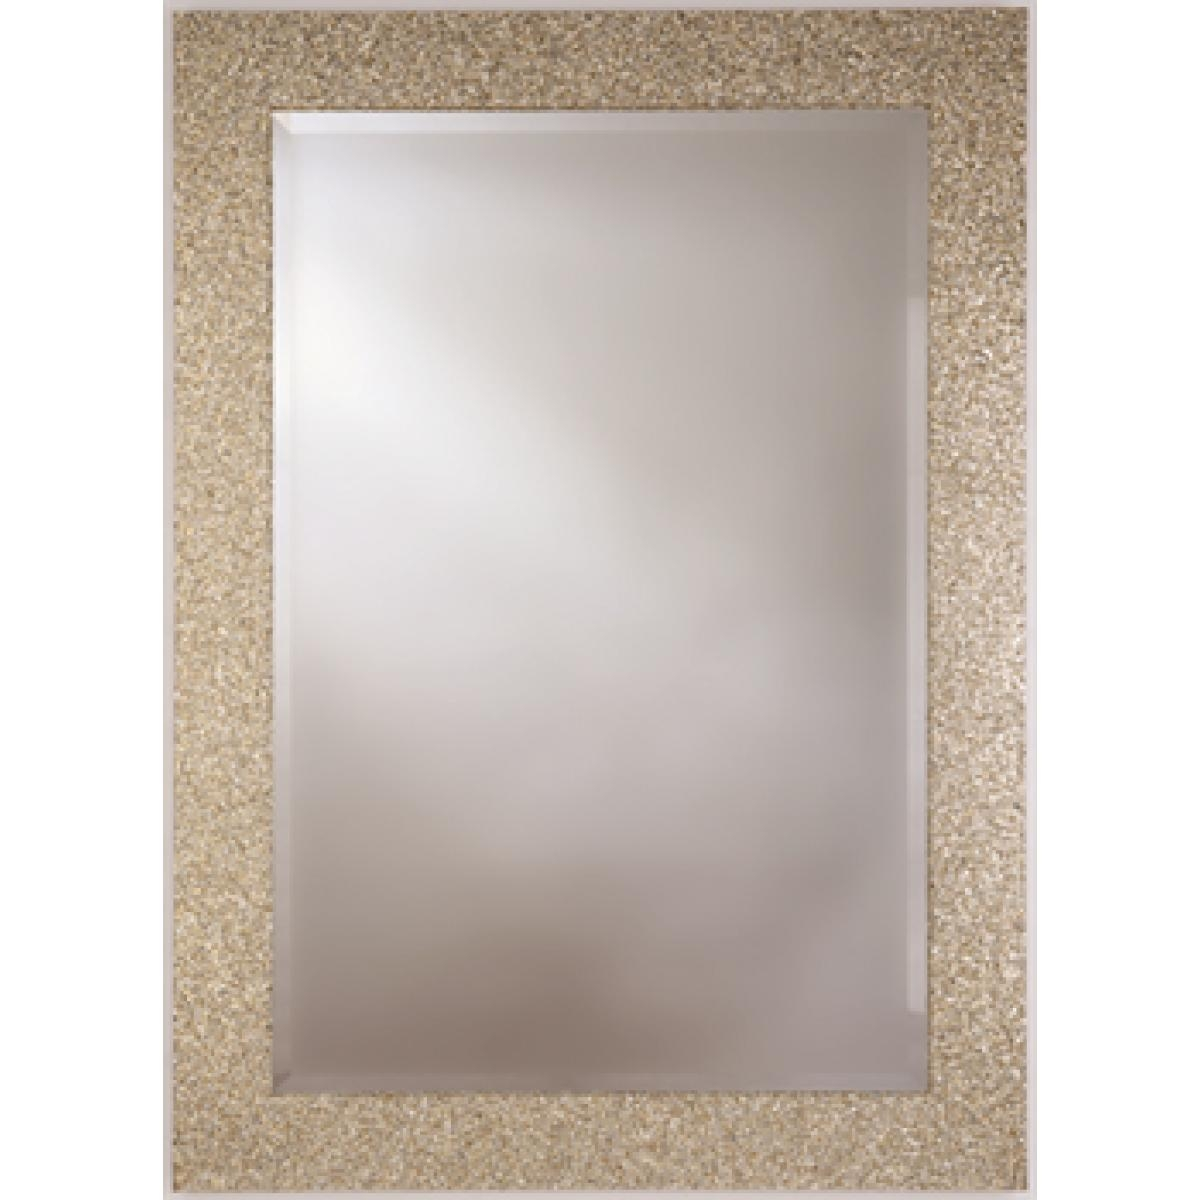 Glitter Mirror | Inovodecor With Regard To Glitter Frame Mirror (Image 10 of 20)